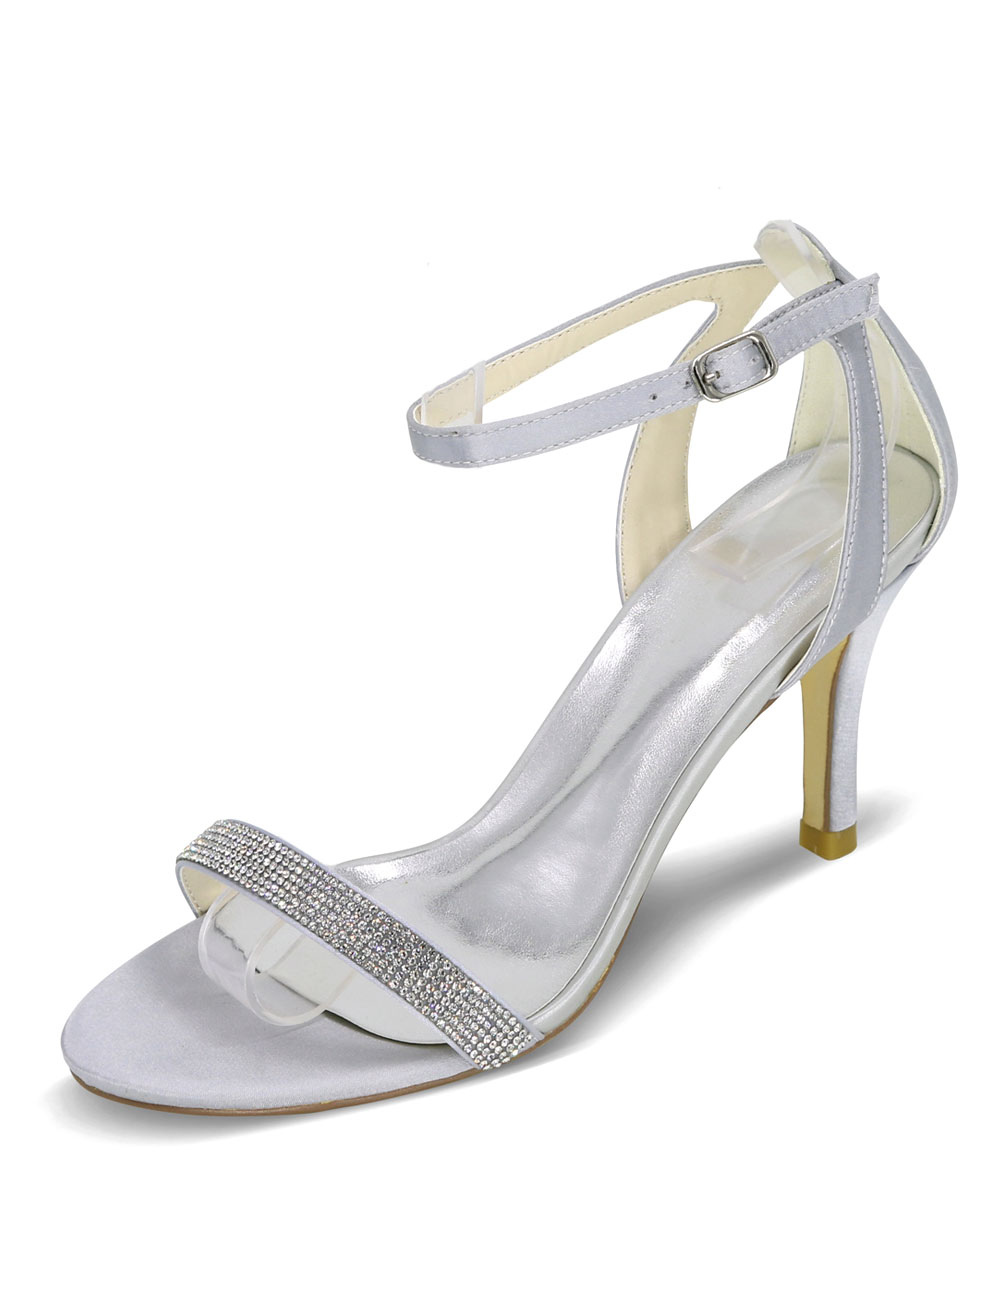 Silver Wedding Sandals High Heel Rhinestones Satin Bridal Shoes